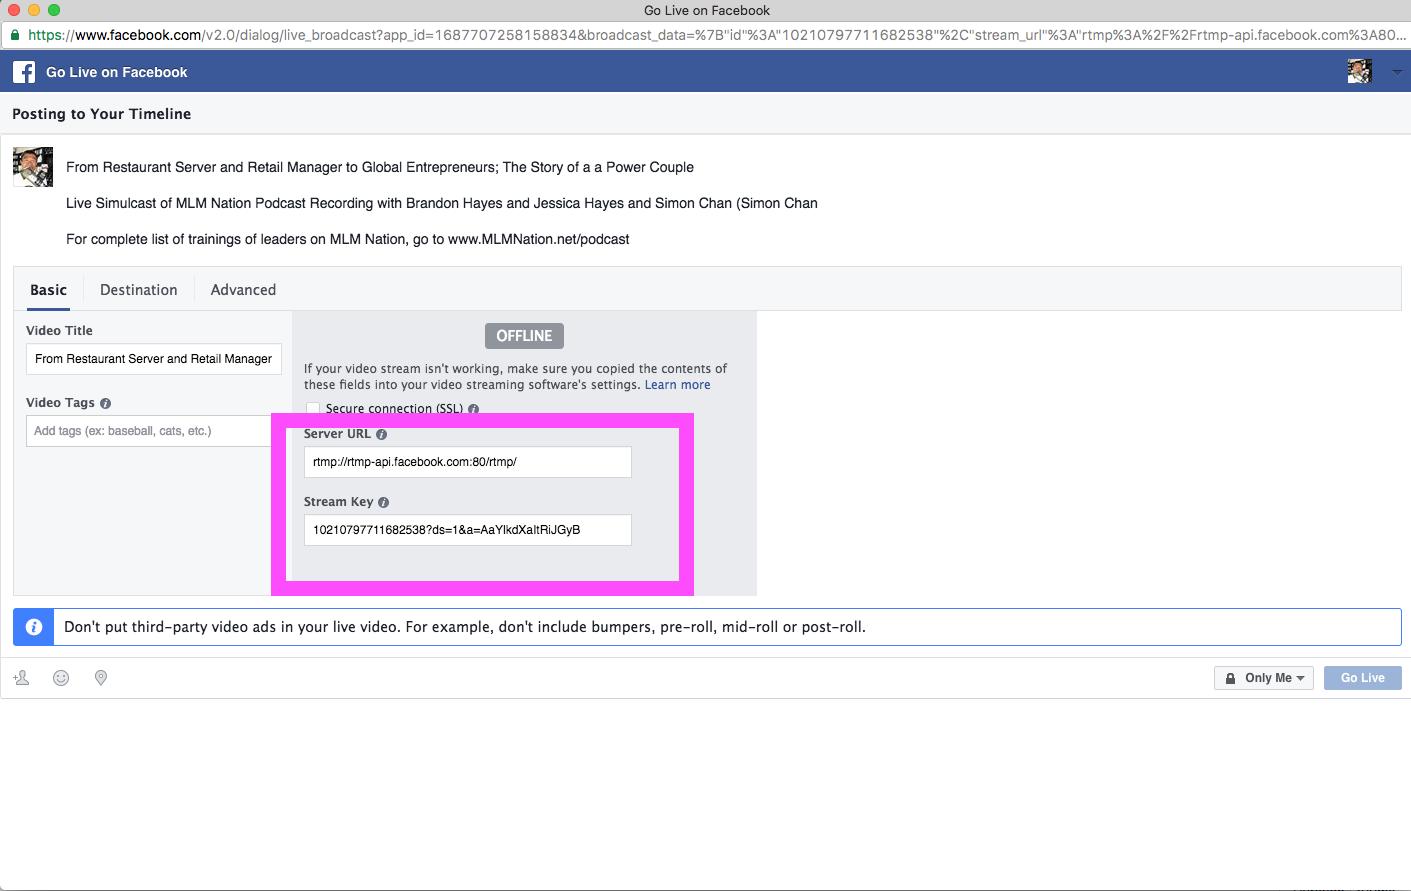 FB Facebook Live Stream Computer stream keys - MLM Nation